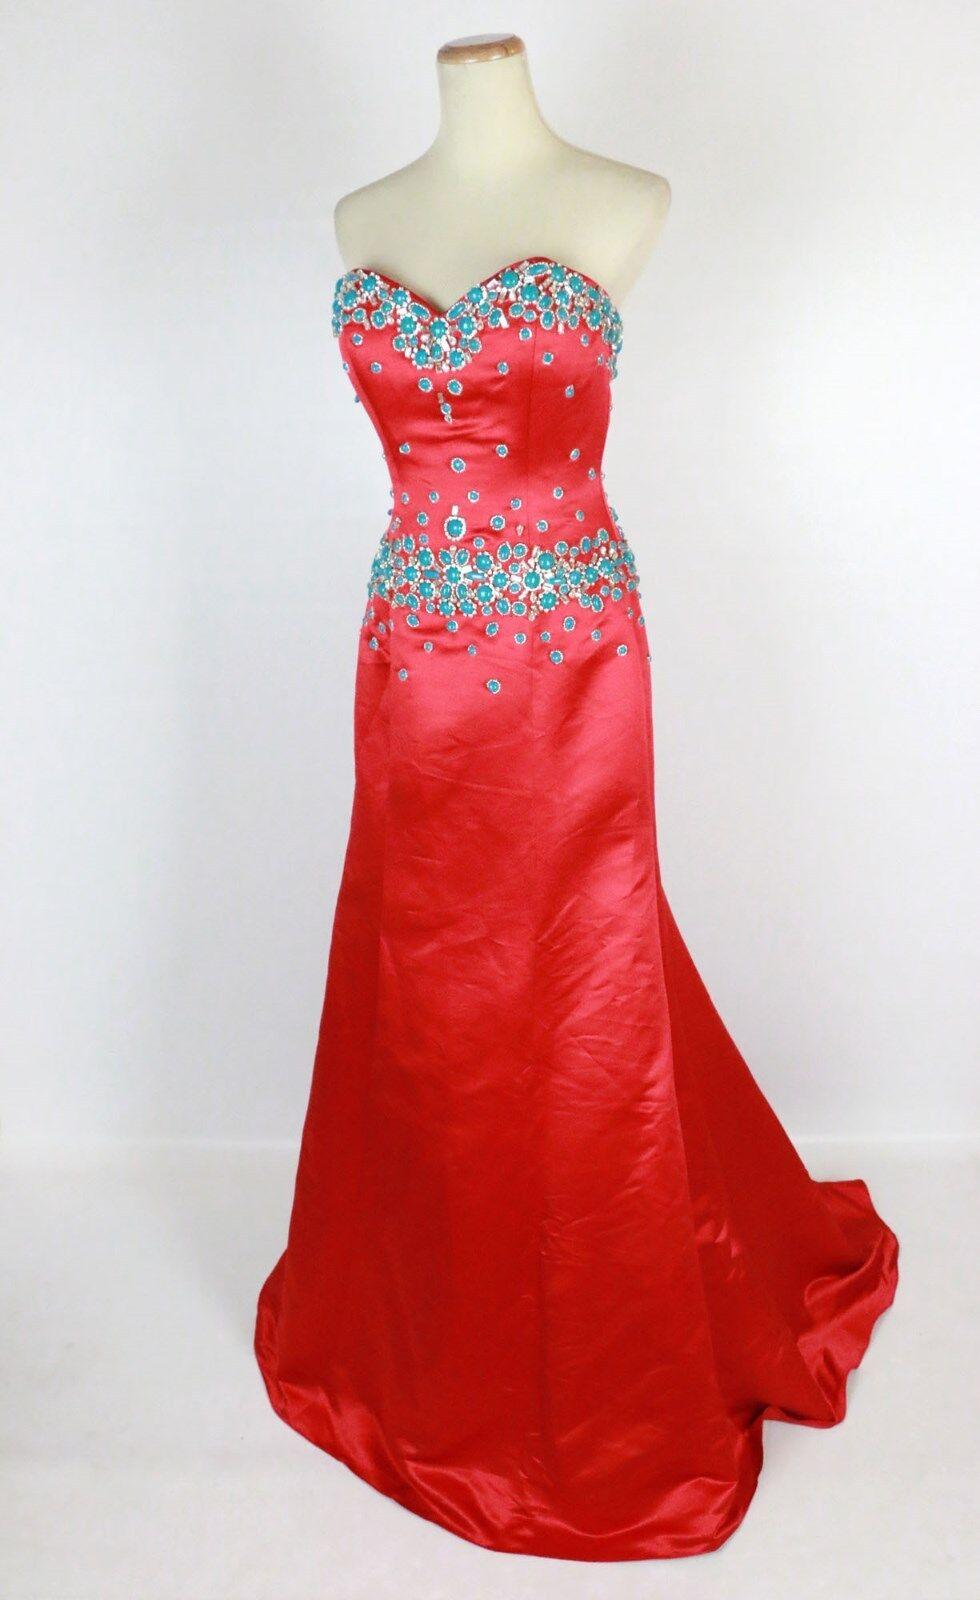 ny  750 Jovani Strapless Satin Dress Long Gown röd Prom Formell Kvällsstorlek 4